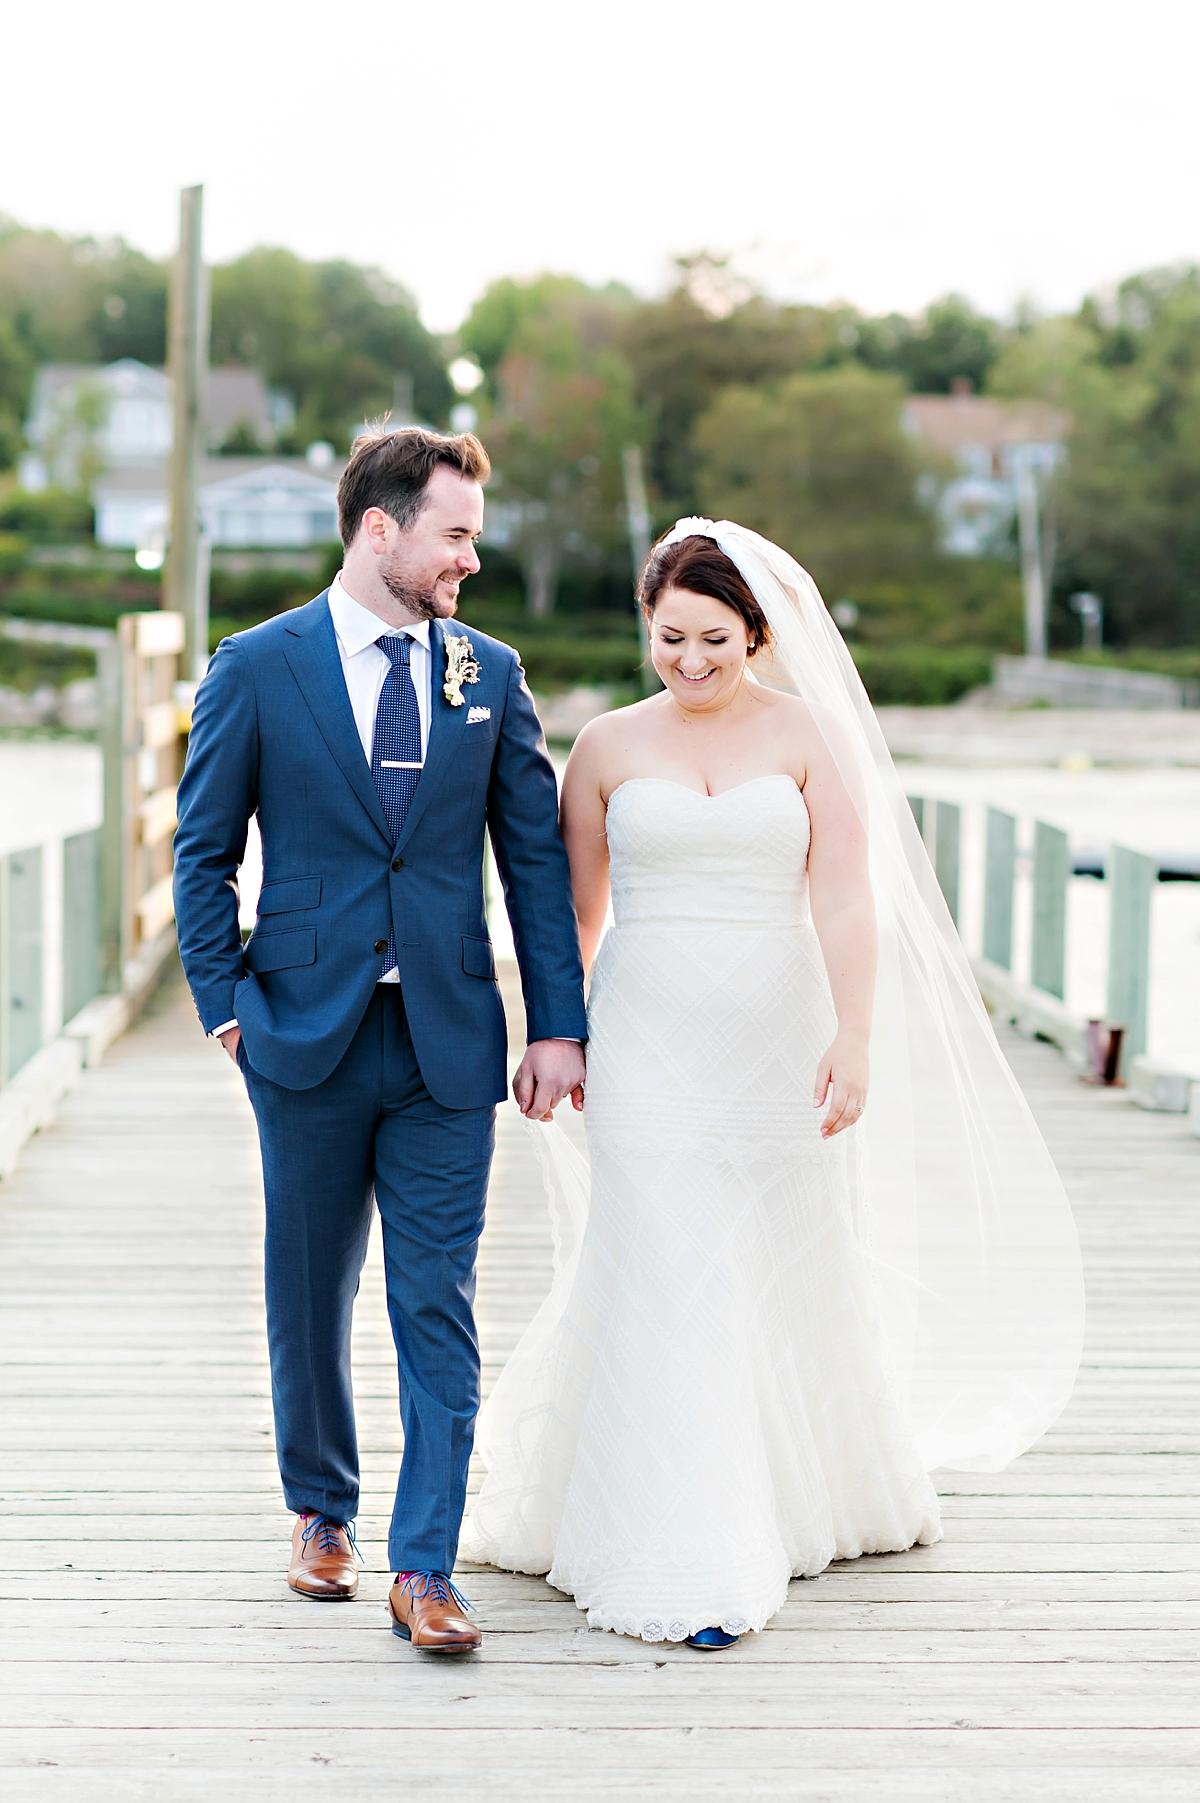 Julie & Taylor's Chester Captains House Wedding, Nova Scotia Wedding Photography098